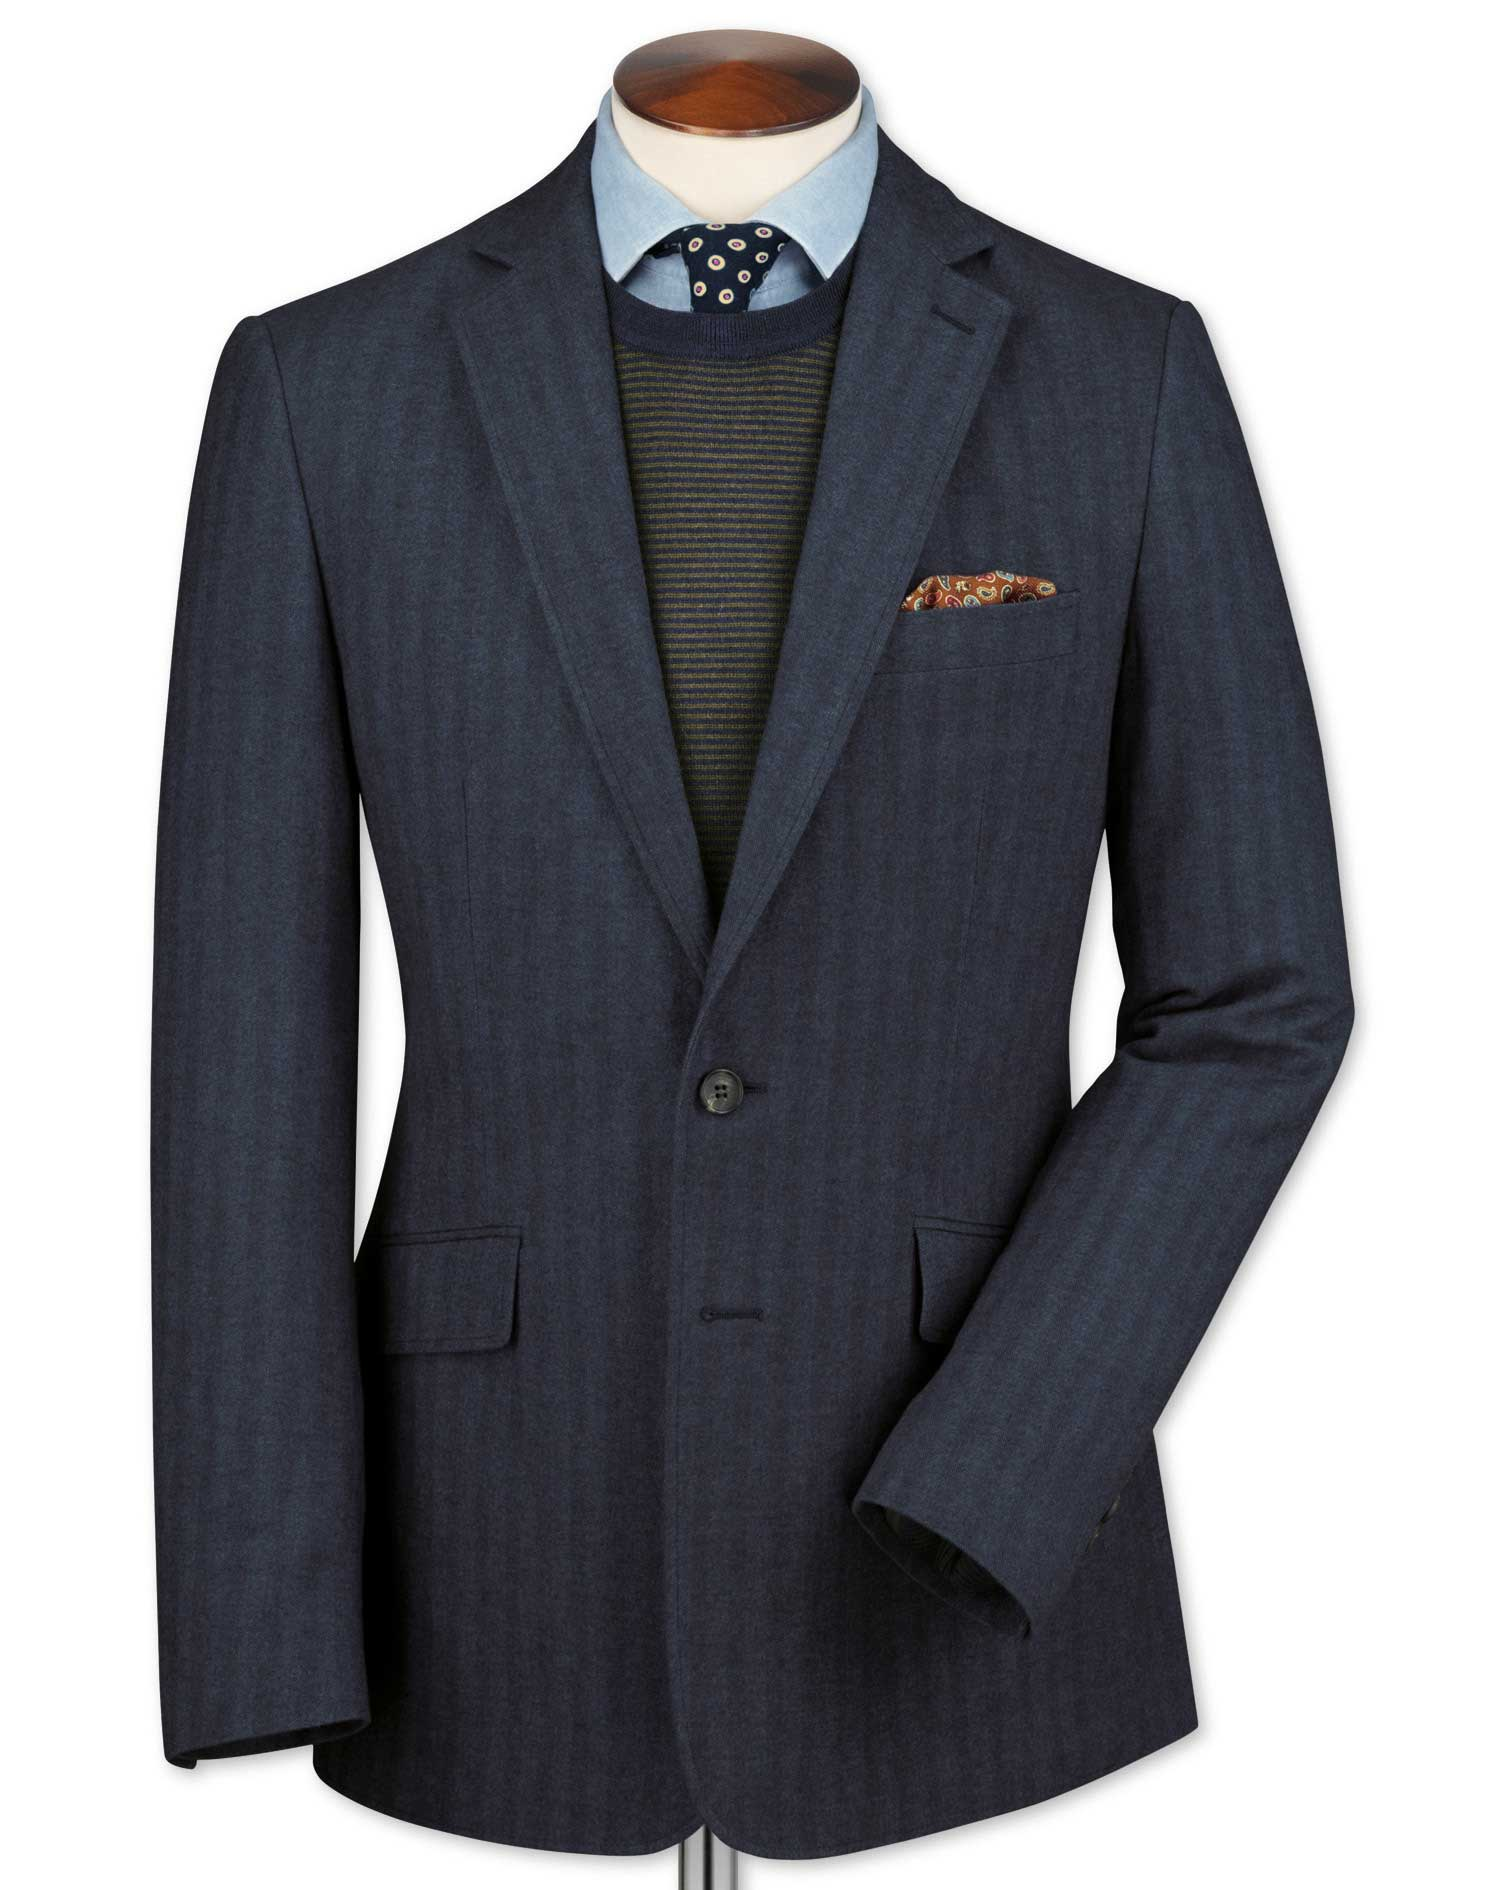 Slim Fit Airforce Blue Herringbone Cotton Flannel Cotton Jacket Size 36 Regular by Charles Tyrwhitt